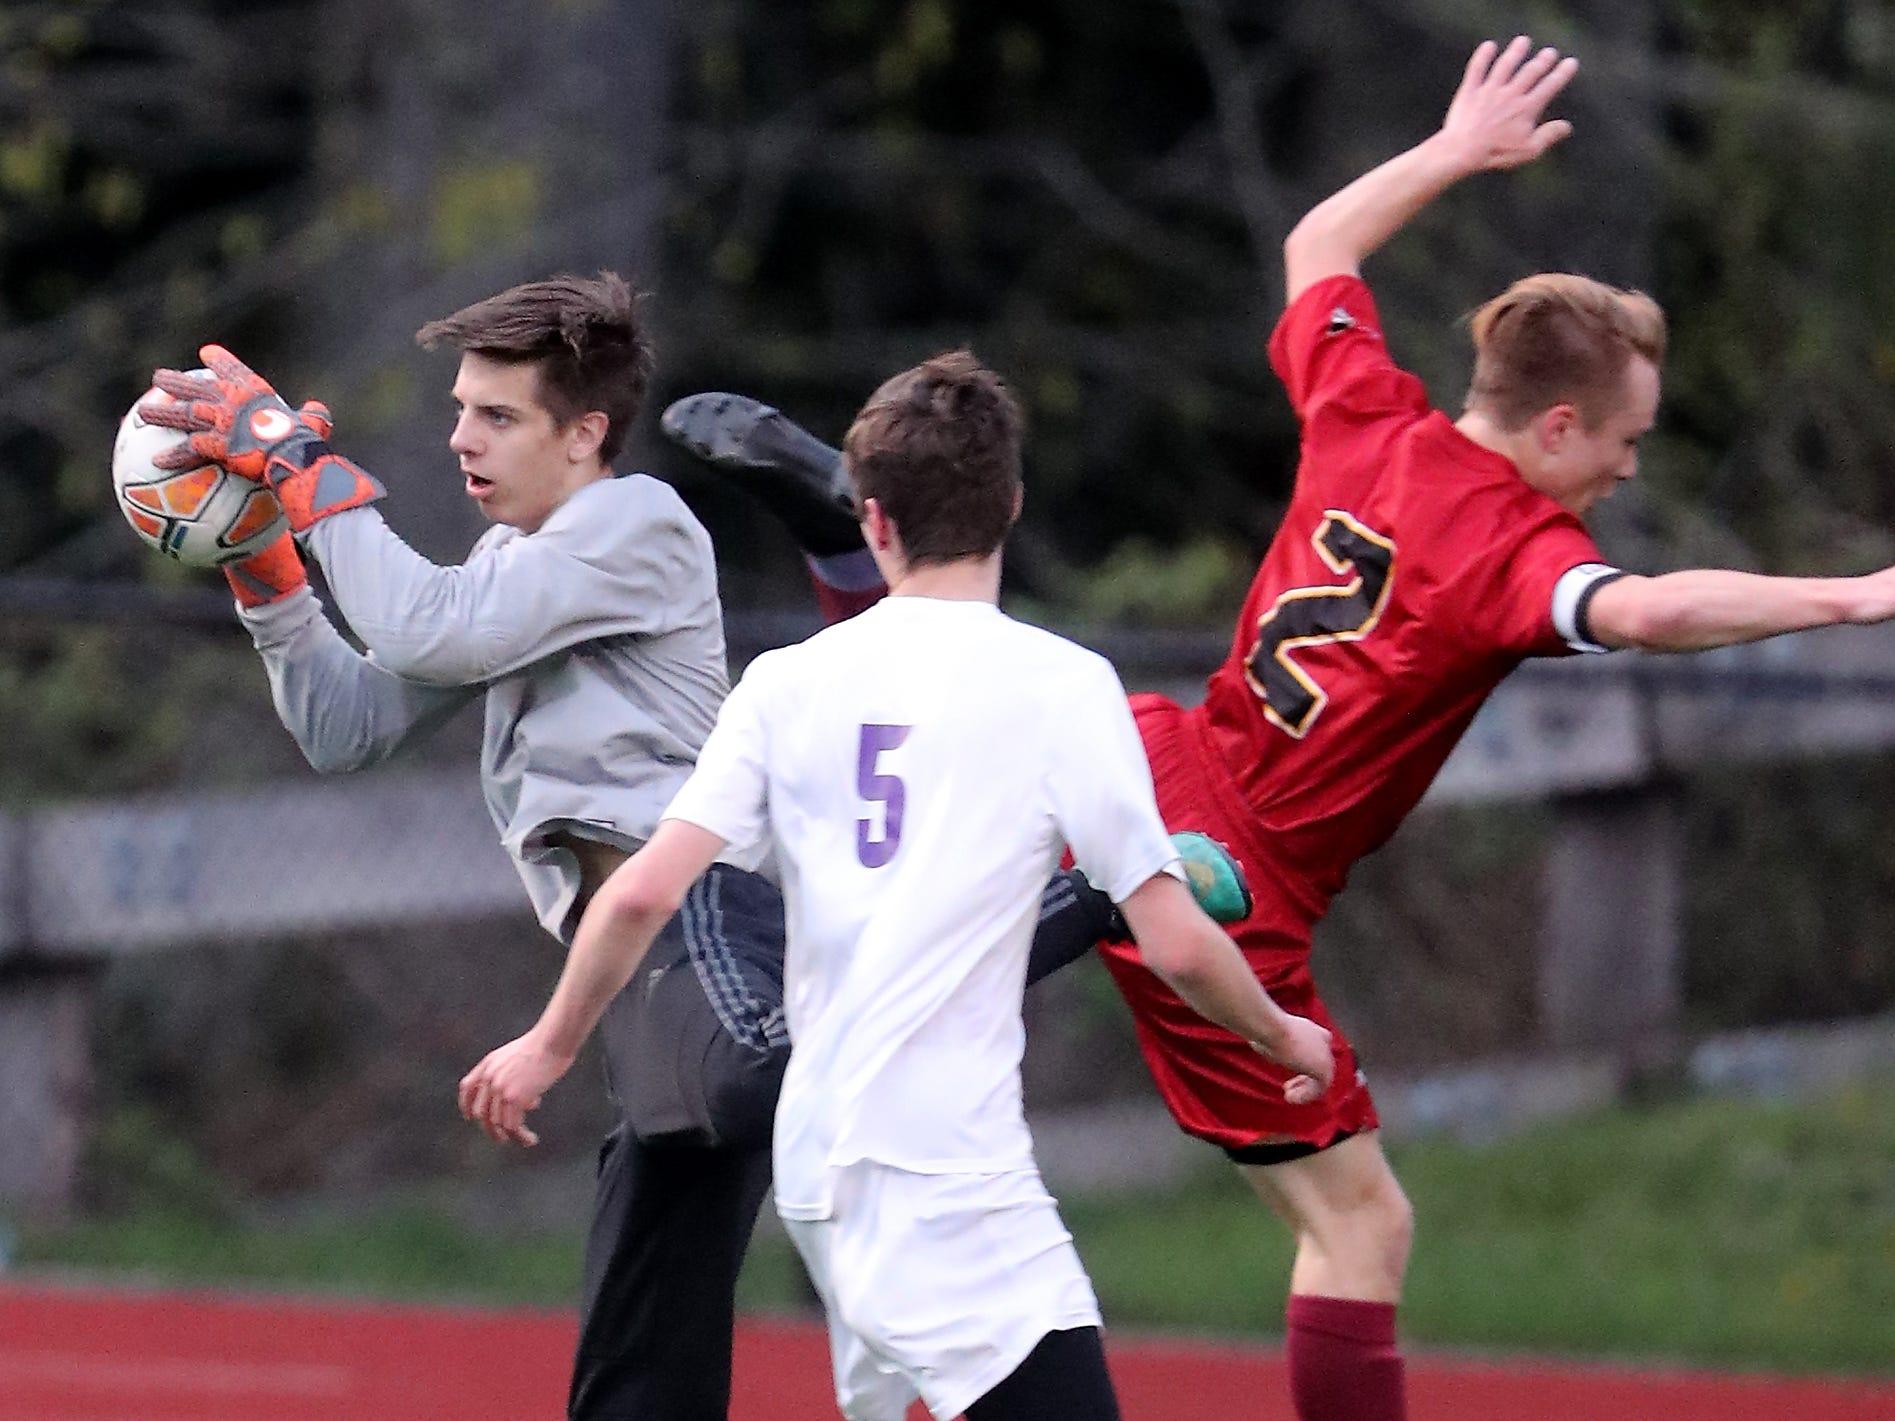 Kingston vs North Kitsap Soccer in Kingston on Tuesday, April 9, 2019.